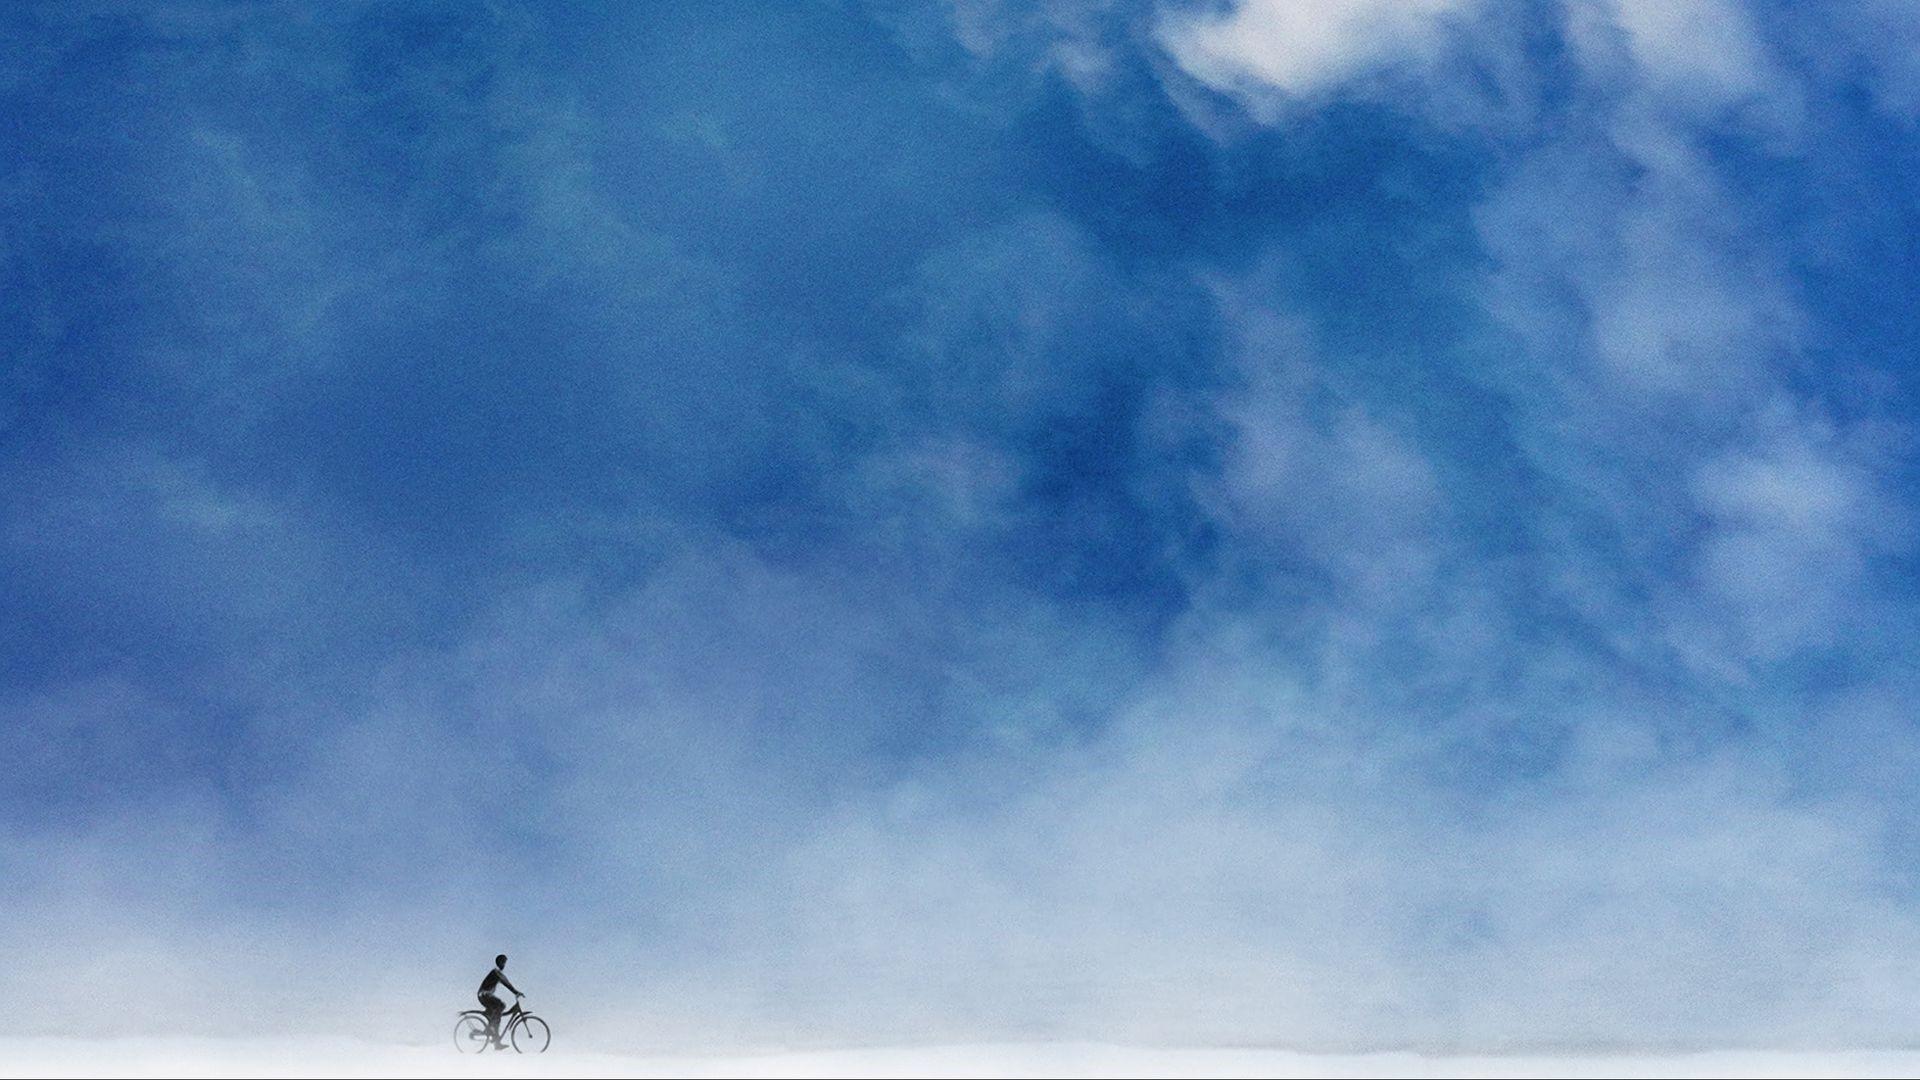 Sky Minimalist Download Wallpaper